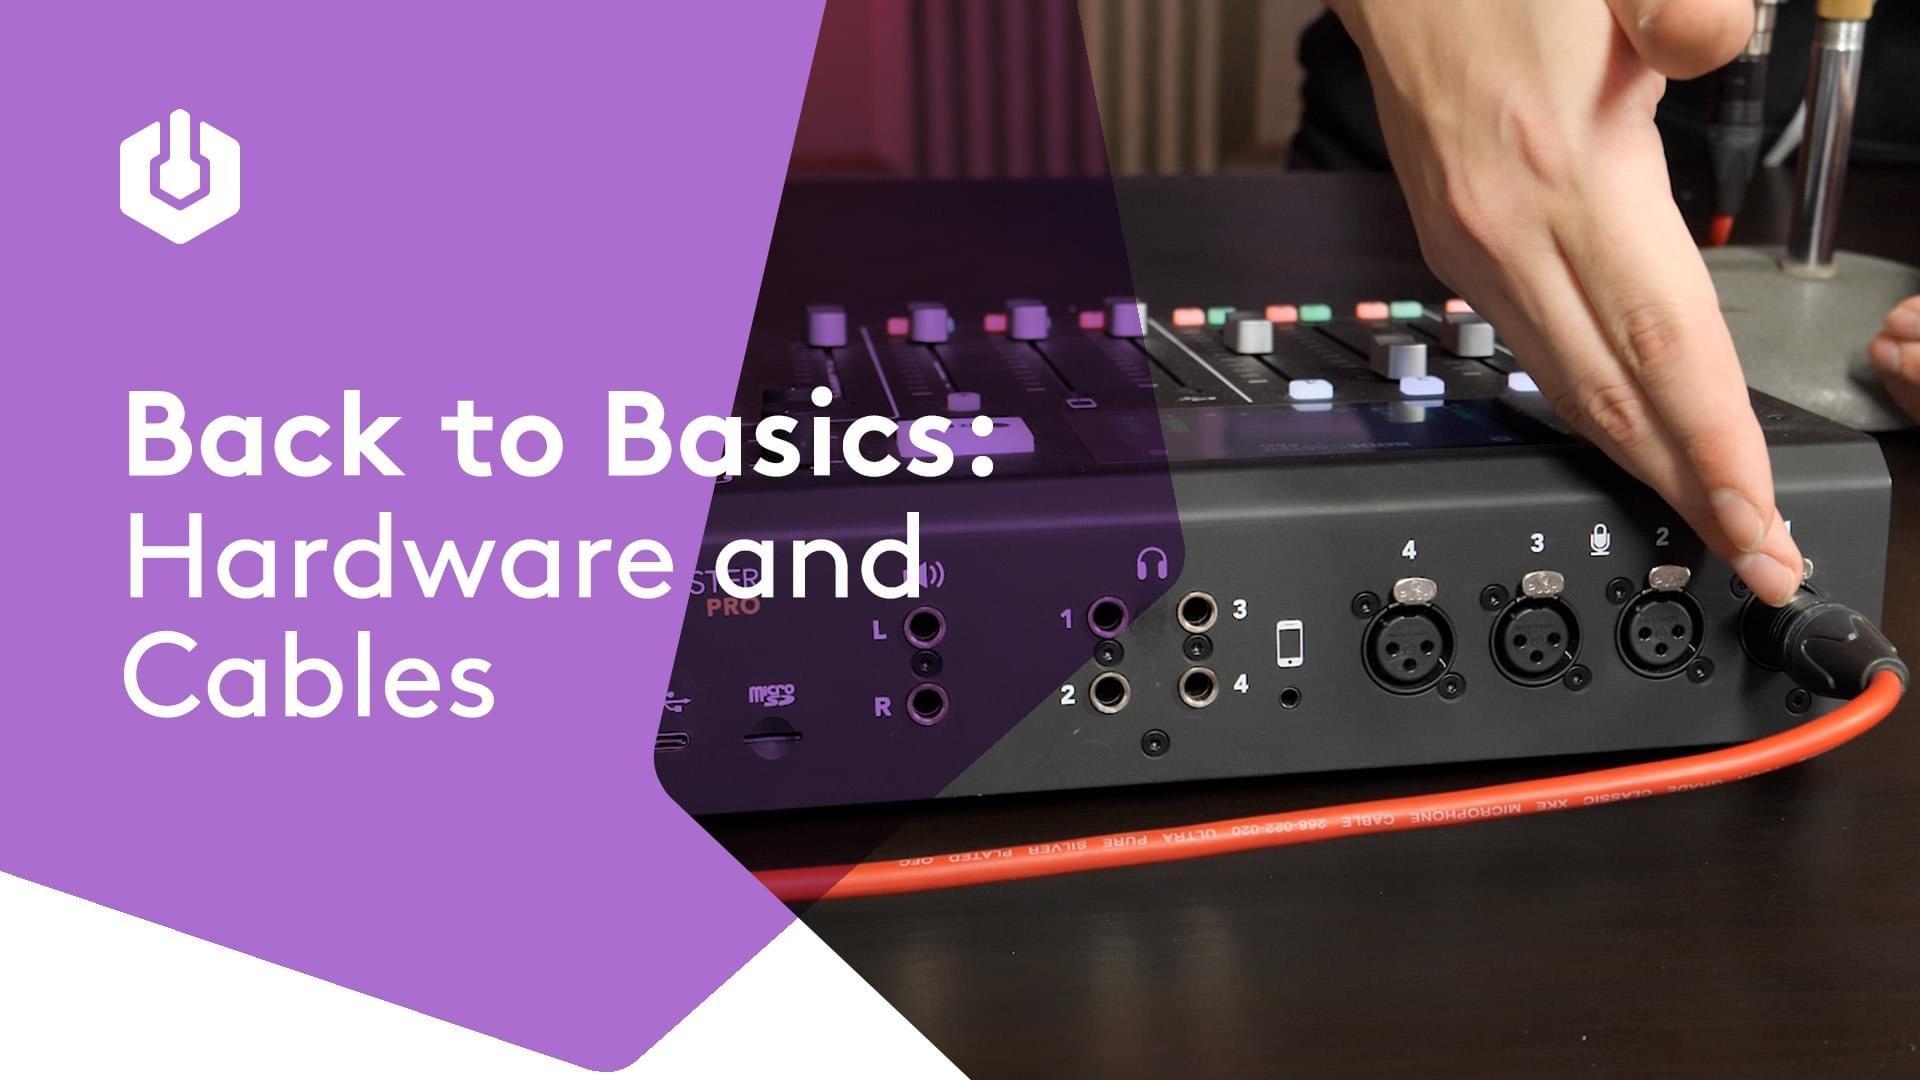 Back To Basics Hardware Cables Thumbnail